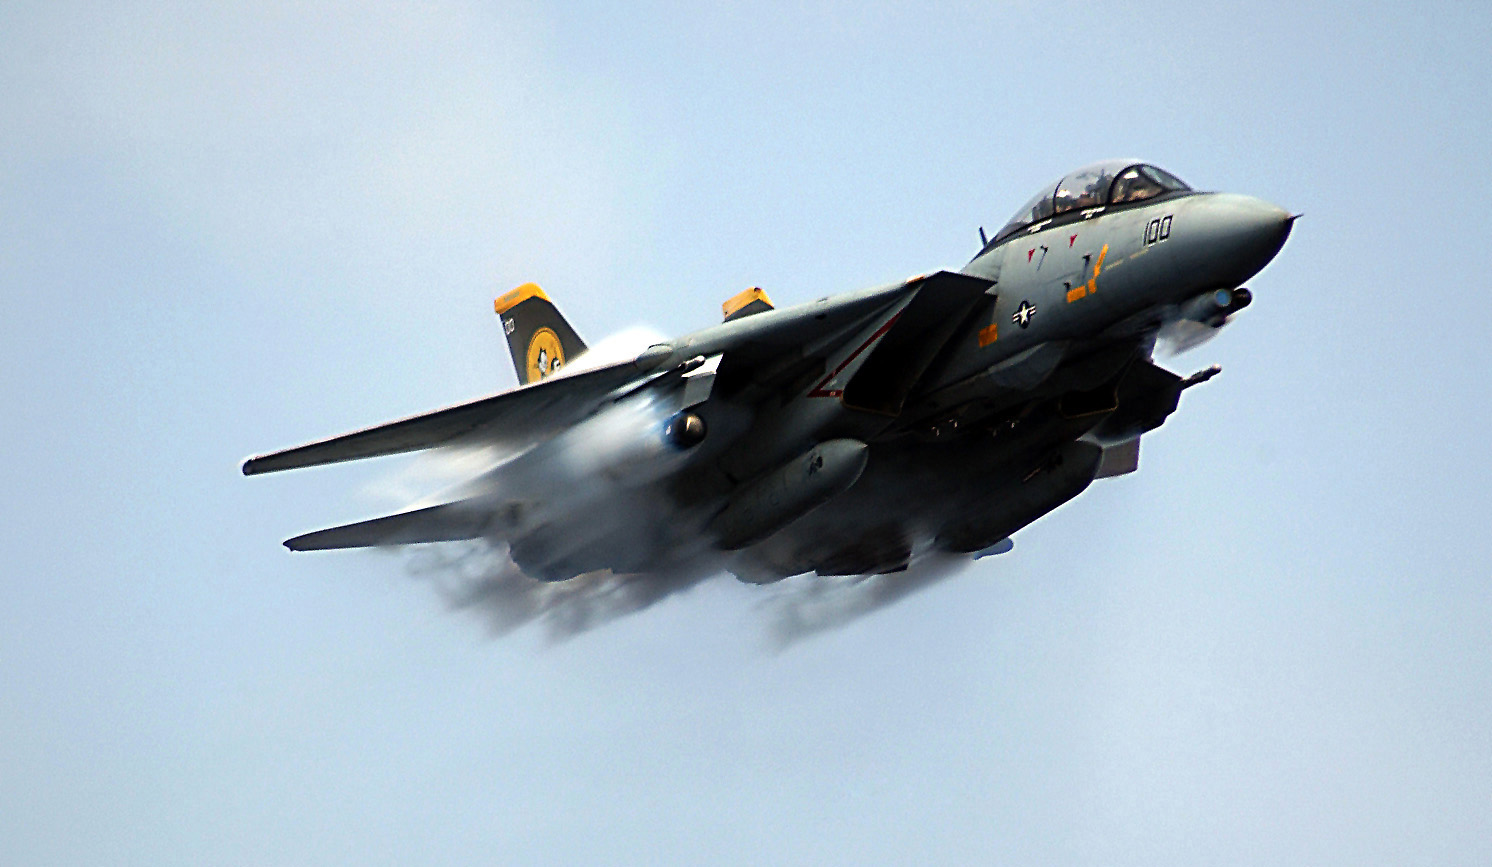 14 tomcat jet fighter - photo #4